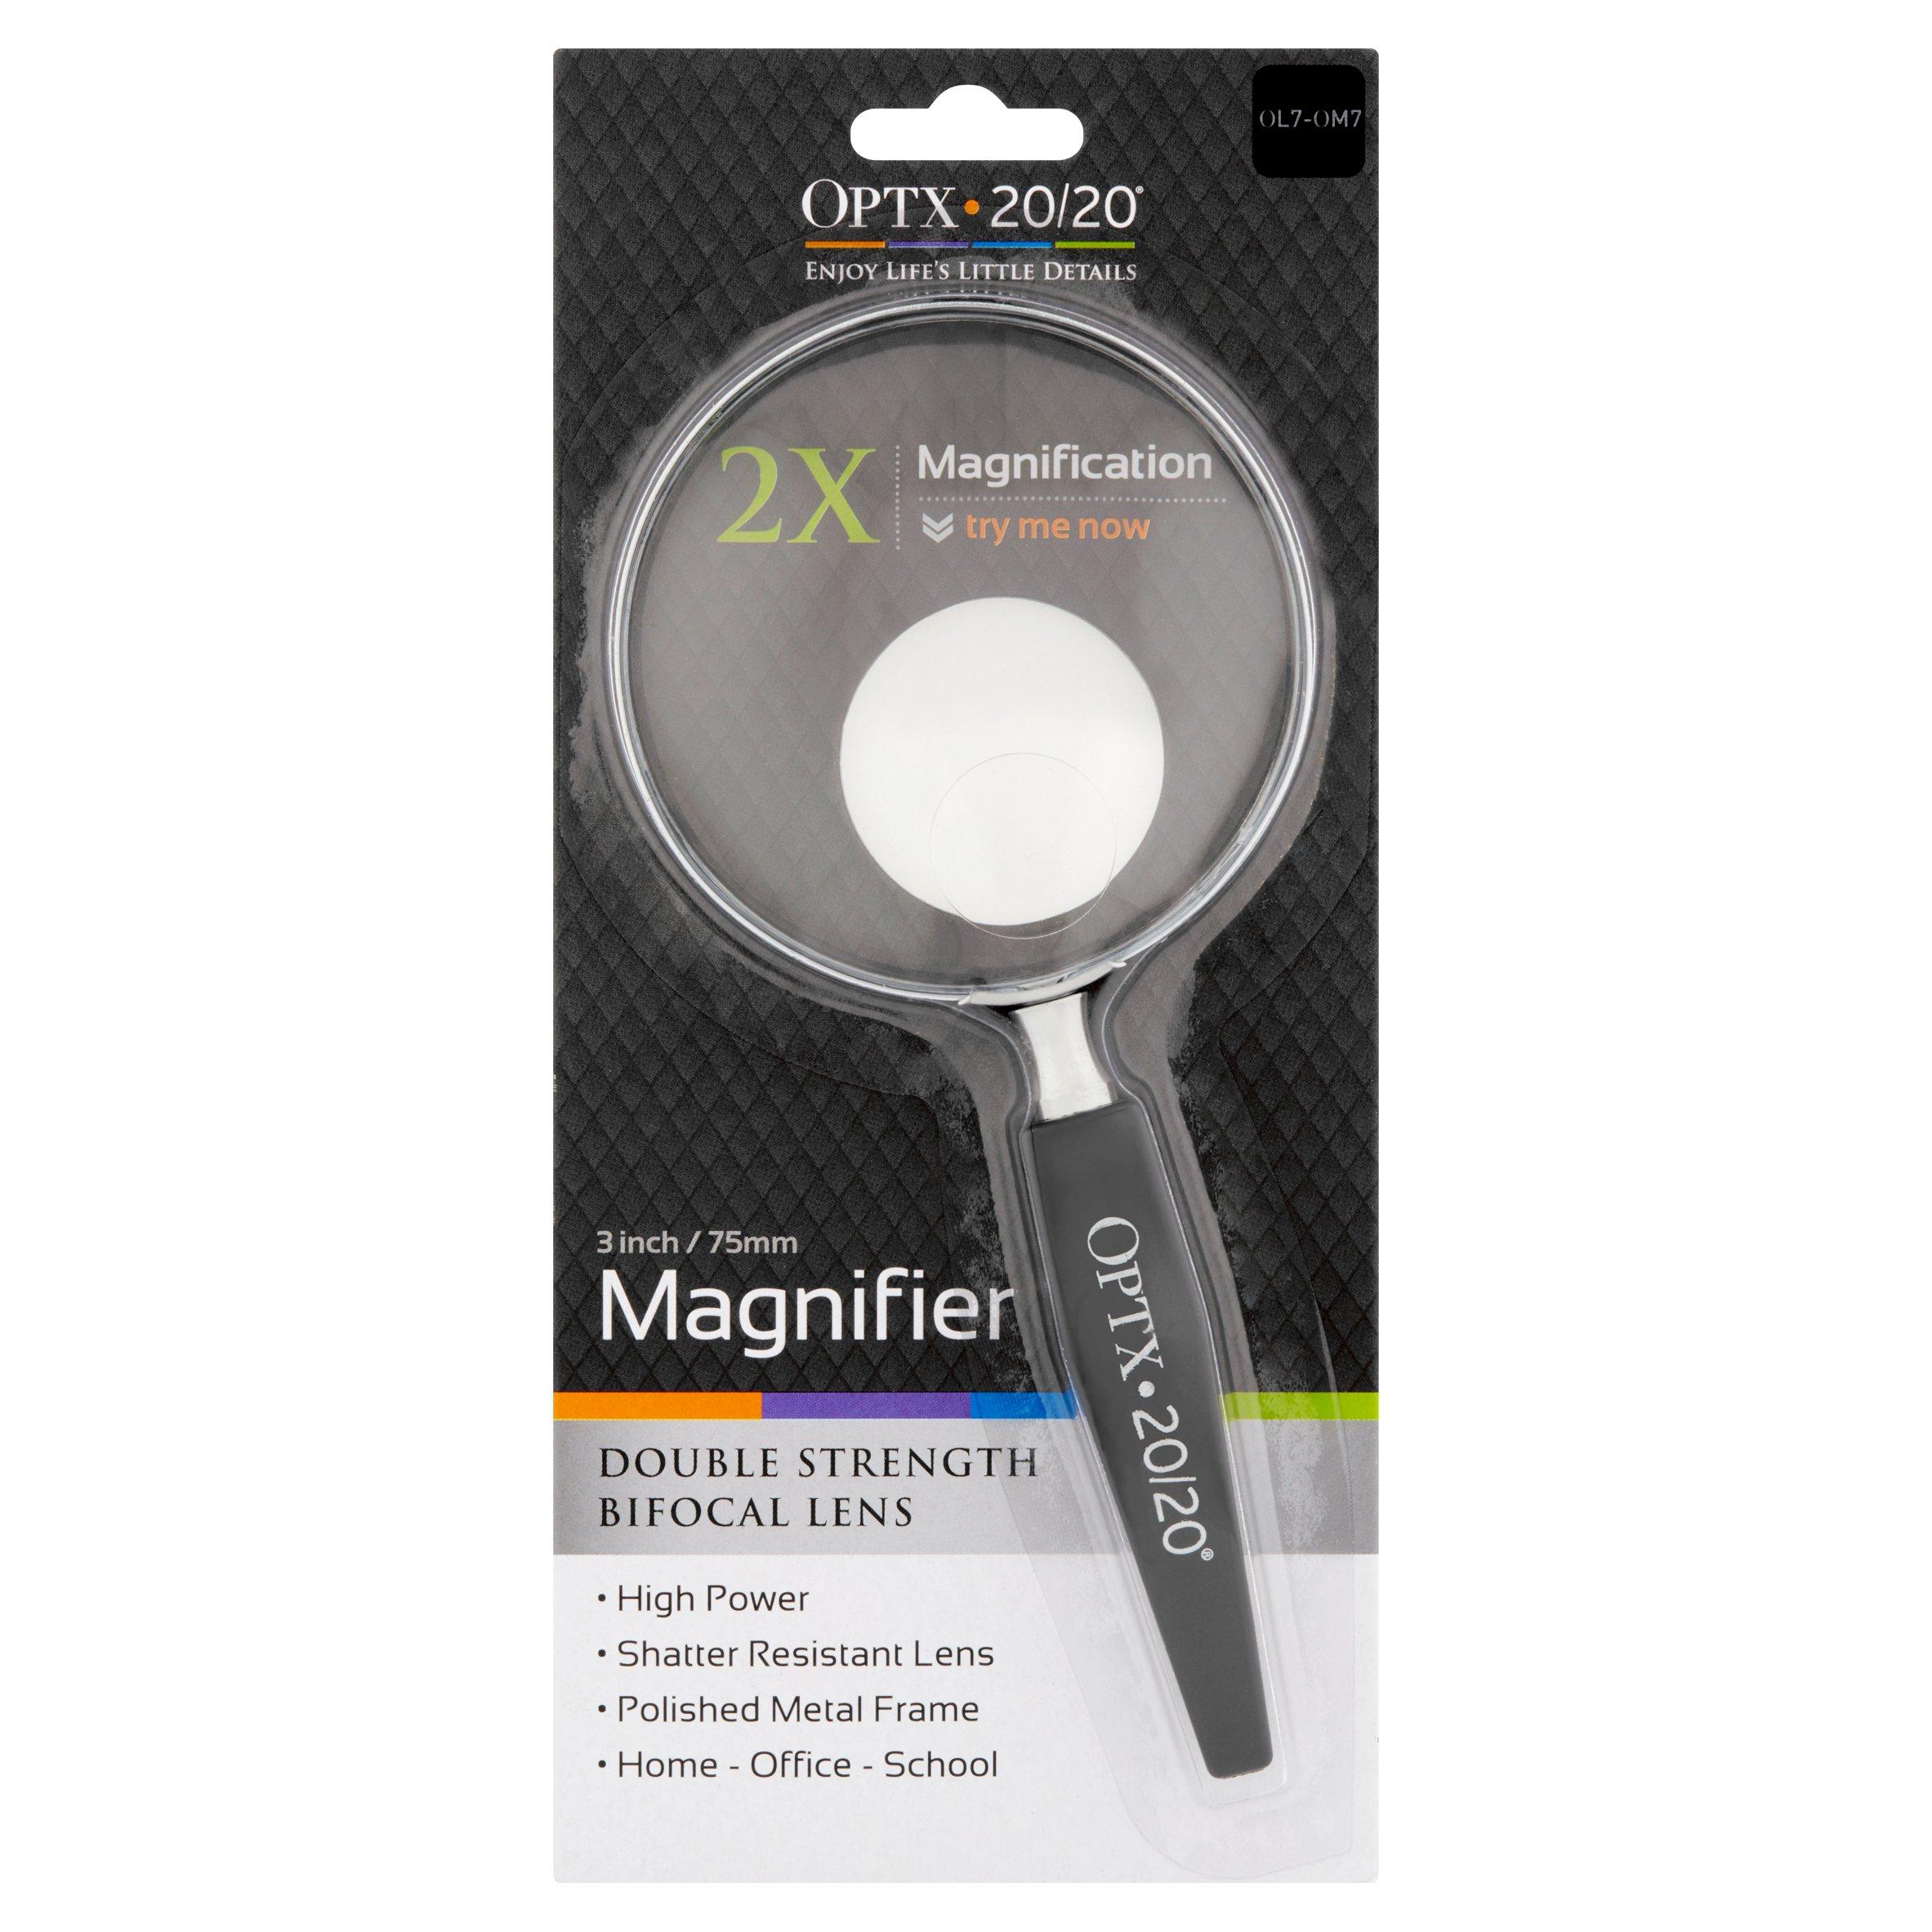 Optx 20/20 OL7-OM7 Magnifier